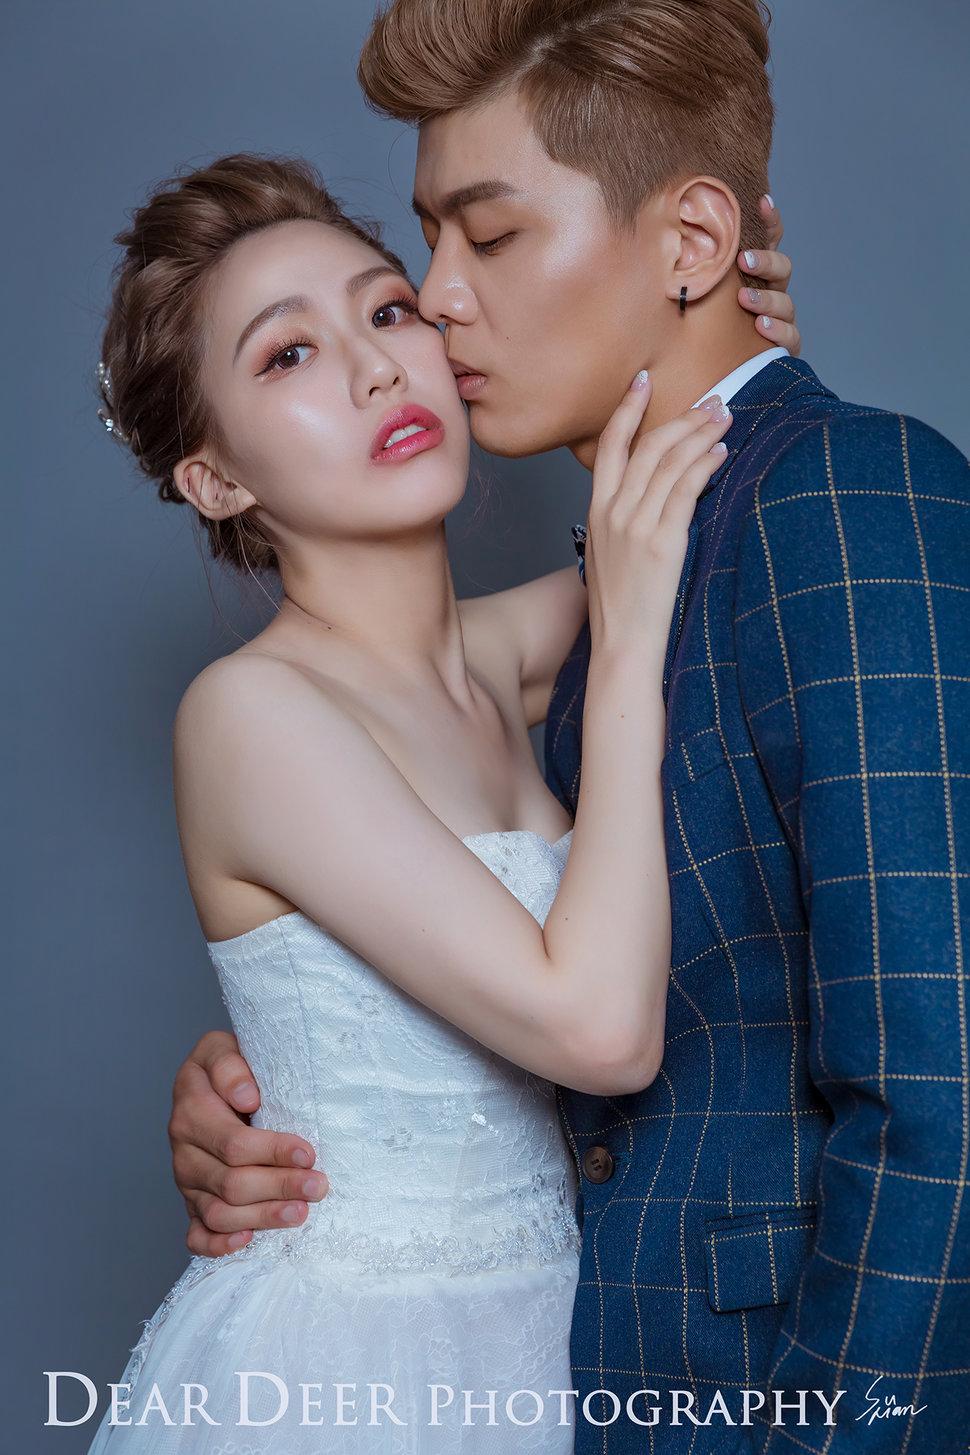 Dear Deer|經典韓系棚拍(編號:2403913) - Dear Deer鹿兒攝影|女攝影師蘇蔓 - 結婚吧